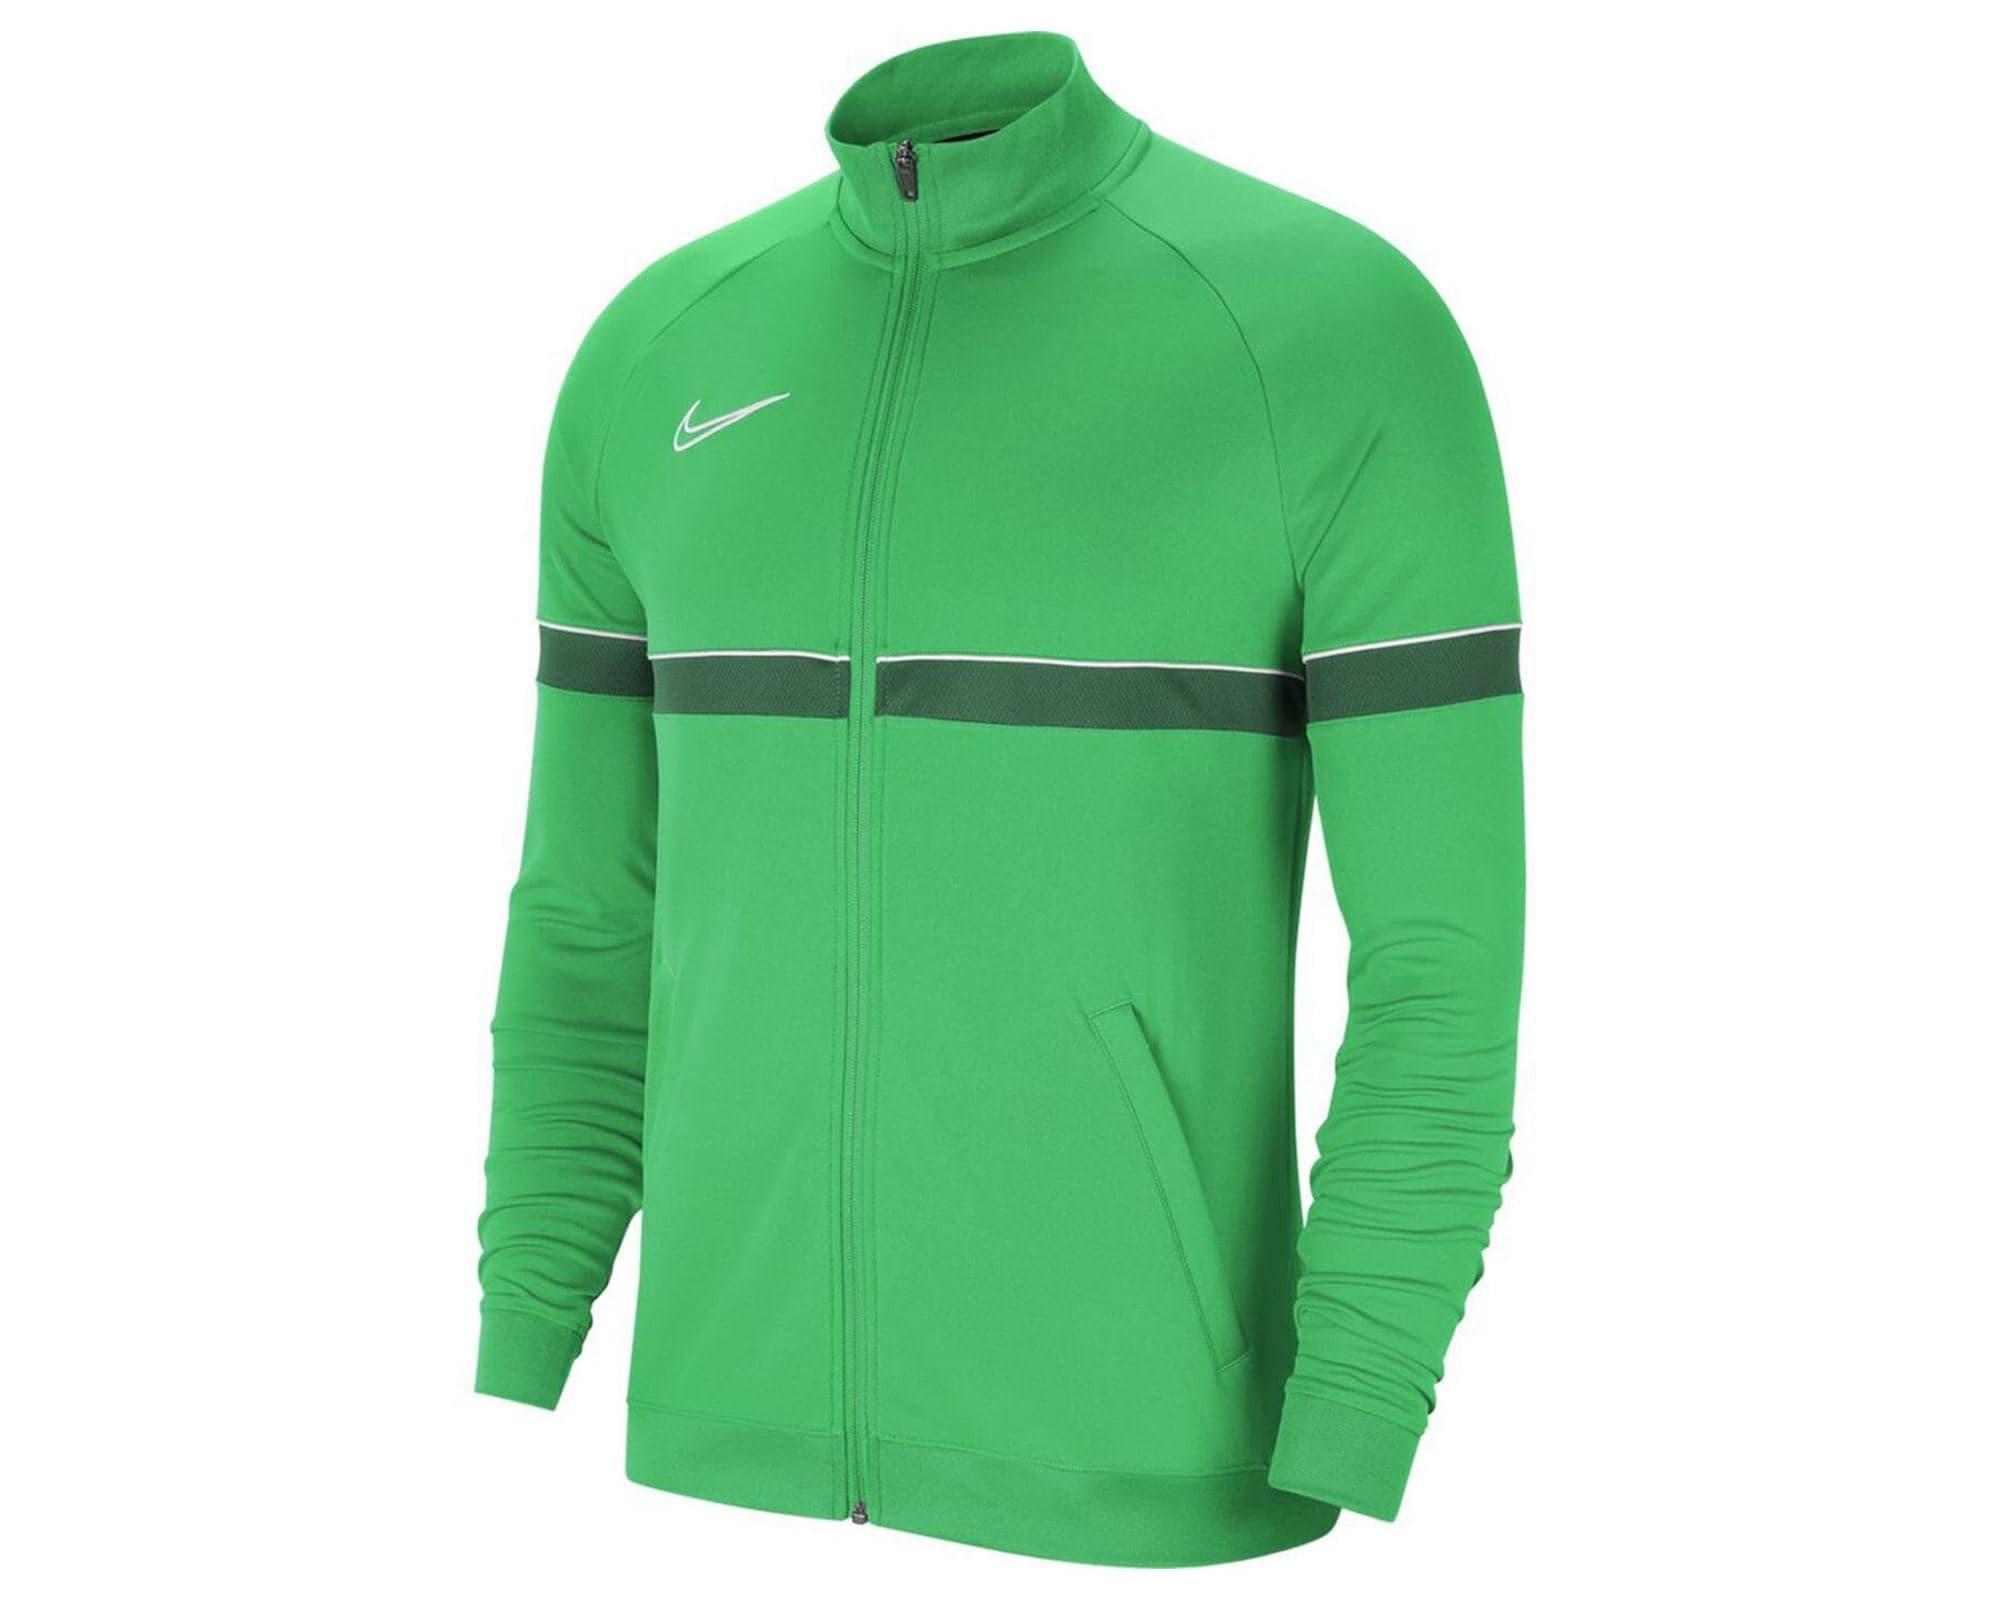 Academy 21 Erkek Yeşil Futbol Ceket (CW6113-362)